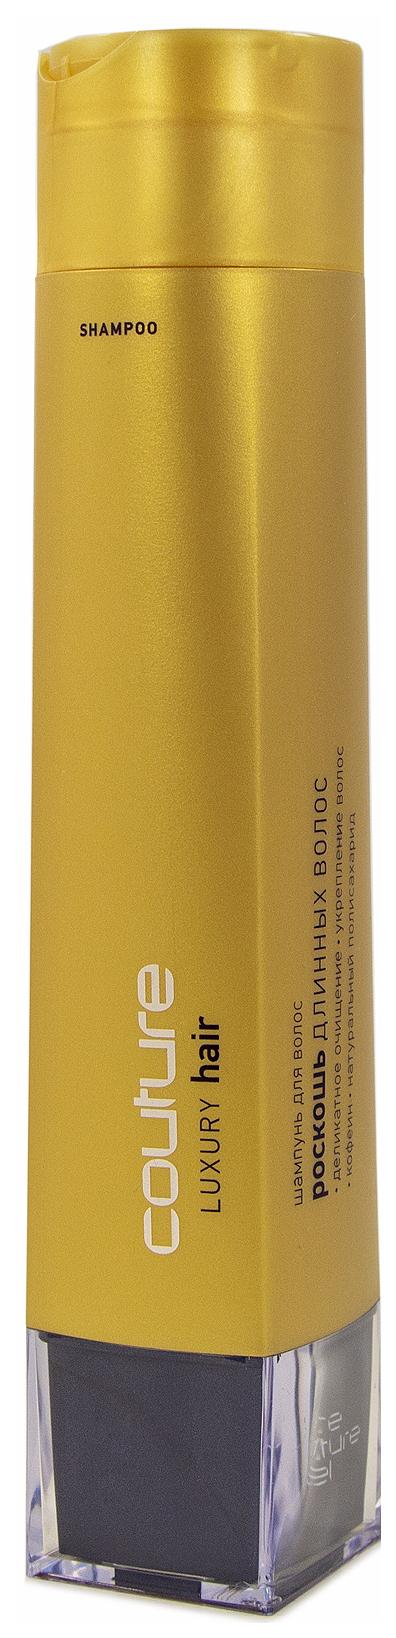 Шампунь для волос Estel Haute Couture Luxury Hair Shampoo 250 мл